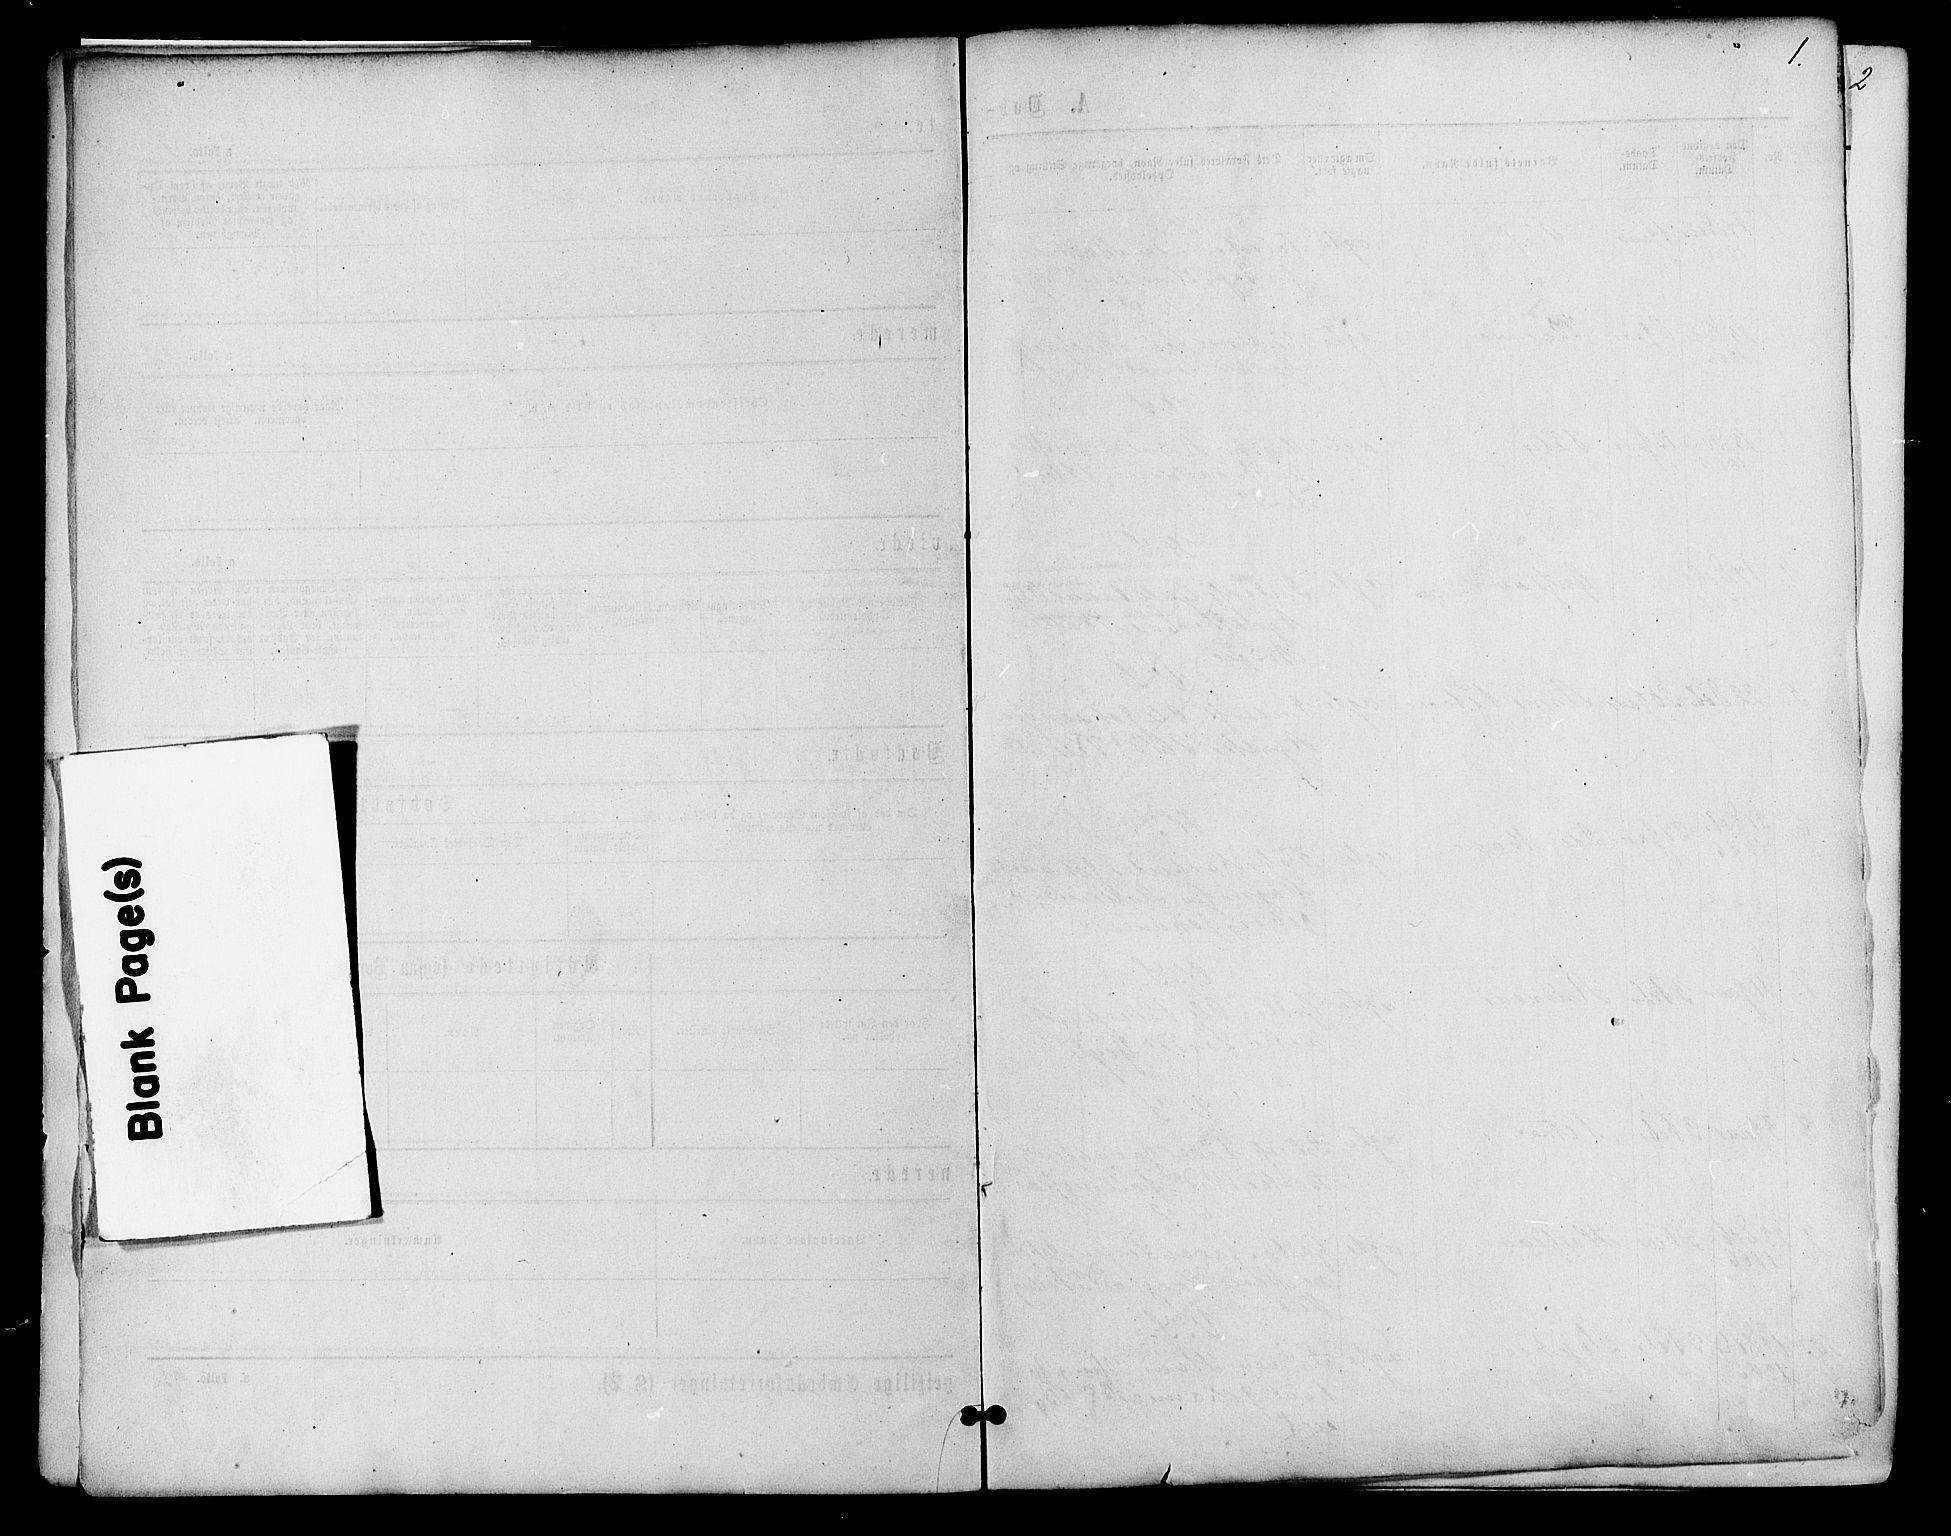 SAH, Vardal prestekontor, H/Ha/Haa/L0007: Ministerialbok nr. 7, 1867-1878, s. 1